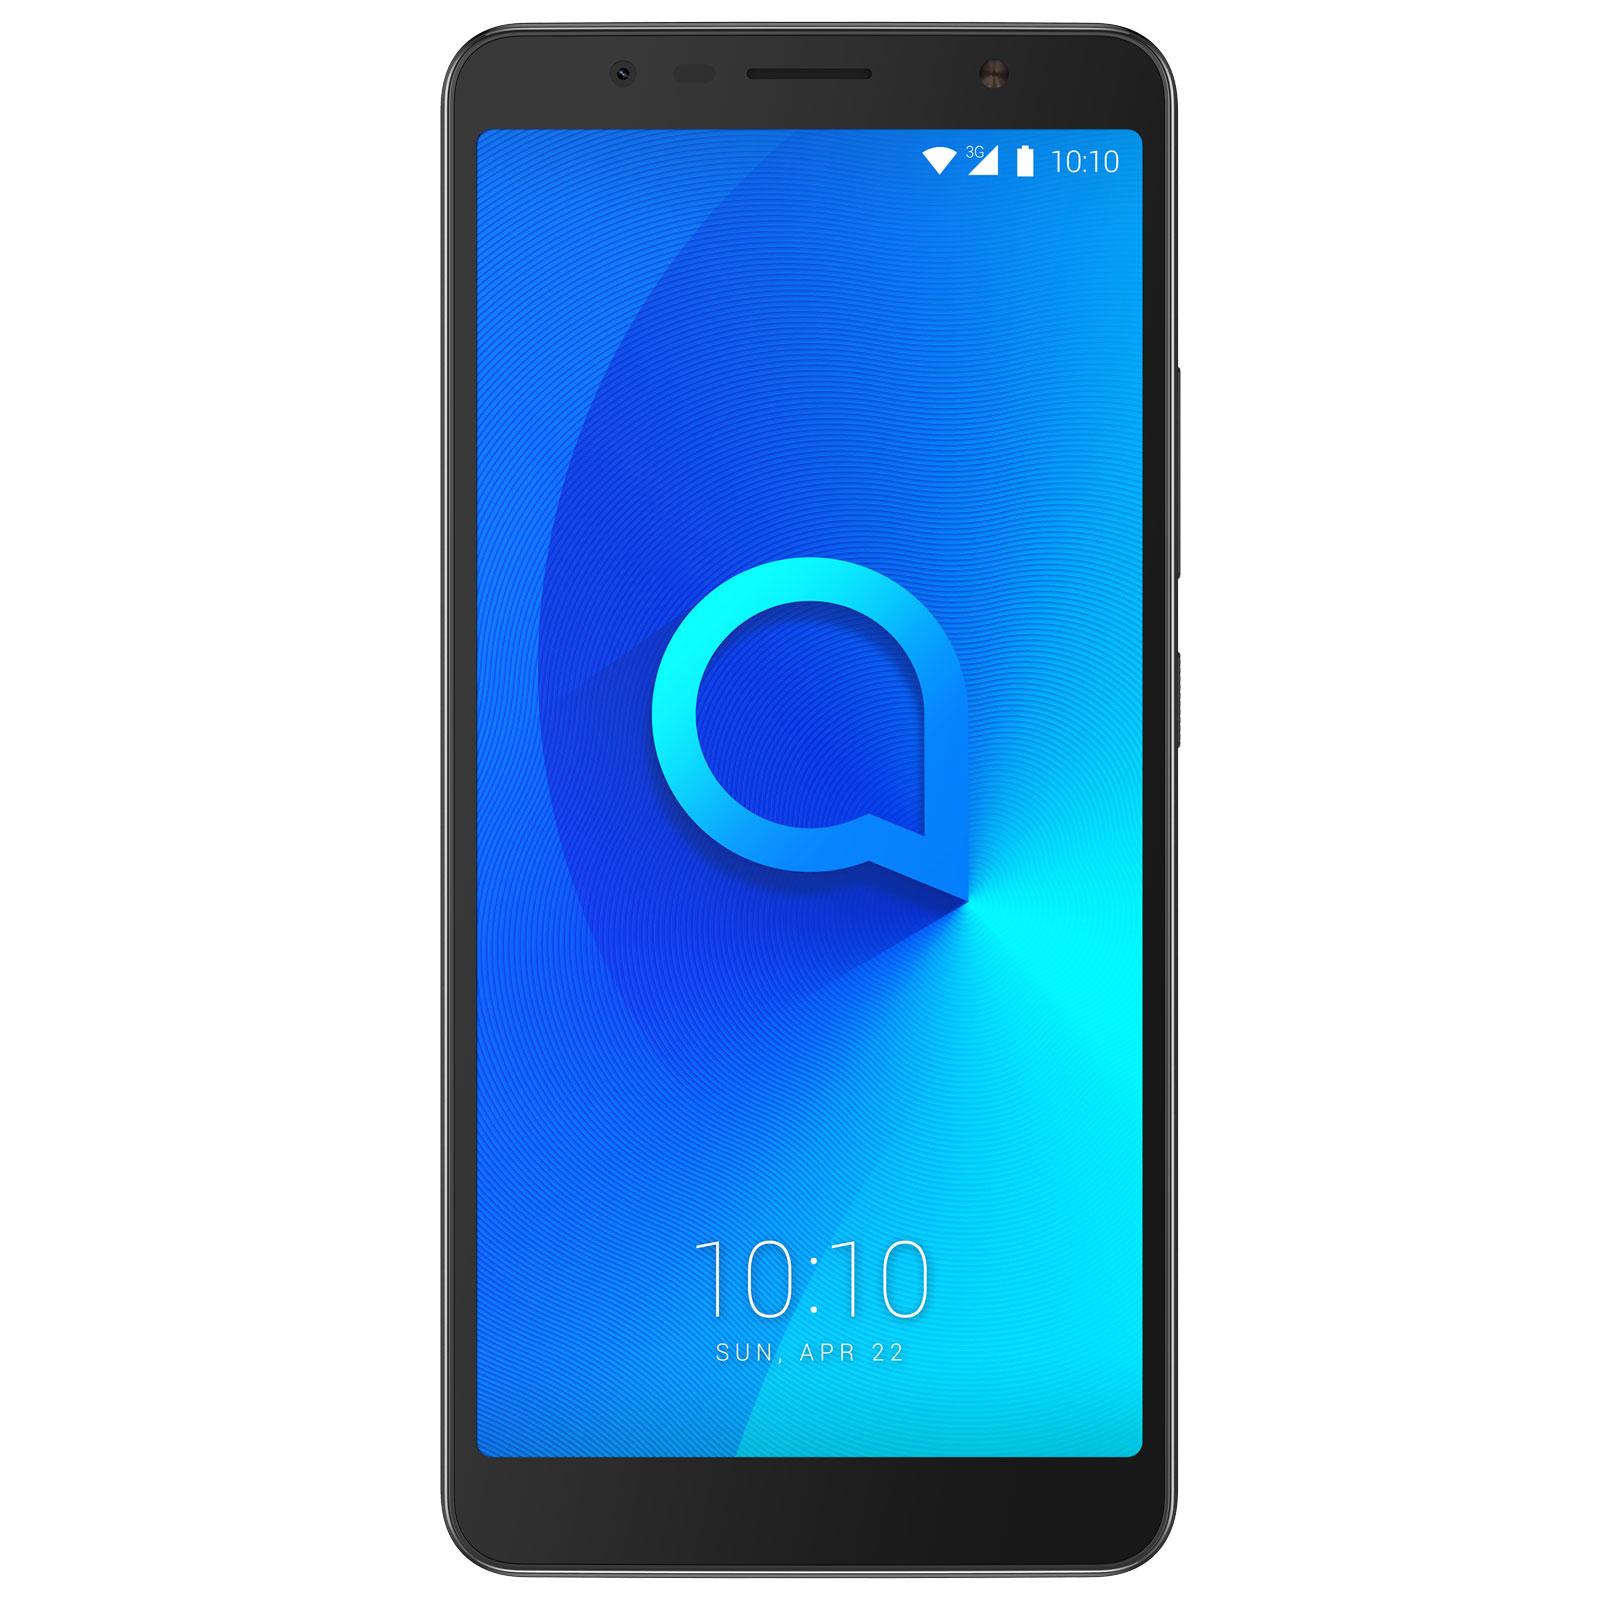 "Mobile & smartphone Alcatel 3c Noir Métallique Smartphone 3G+ Dual SIM - MediaTek MT8321 Quad-Core 1.3 GHz - RAM 1 Go - Ecran tactile 6"" 720 x 1440 - 16 Go - Bluetooth 4.2 - 3000 mAh - Android 7.0"